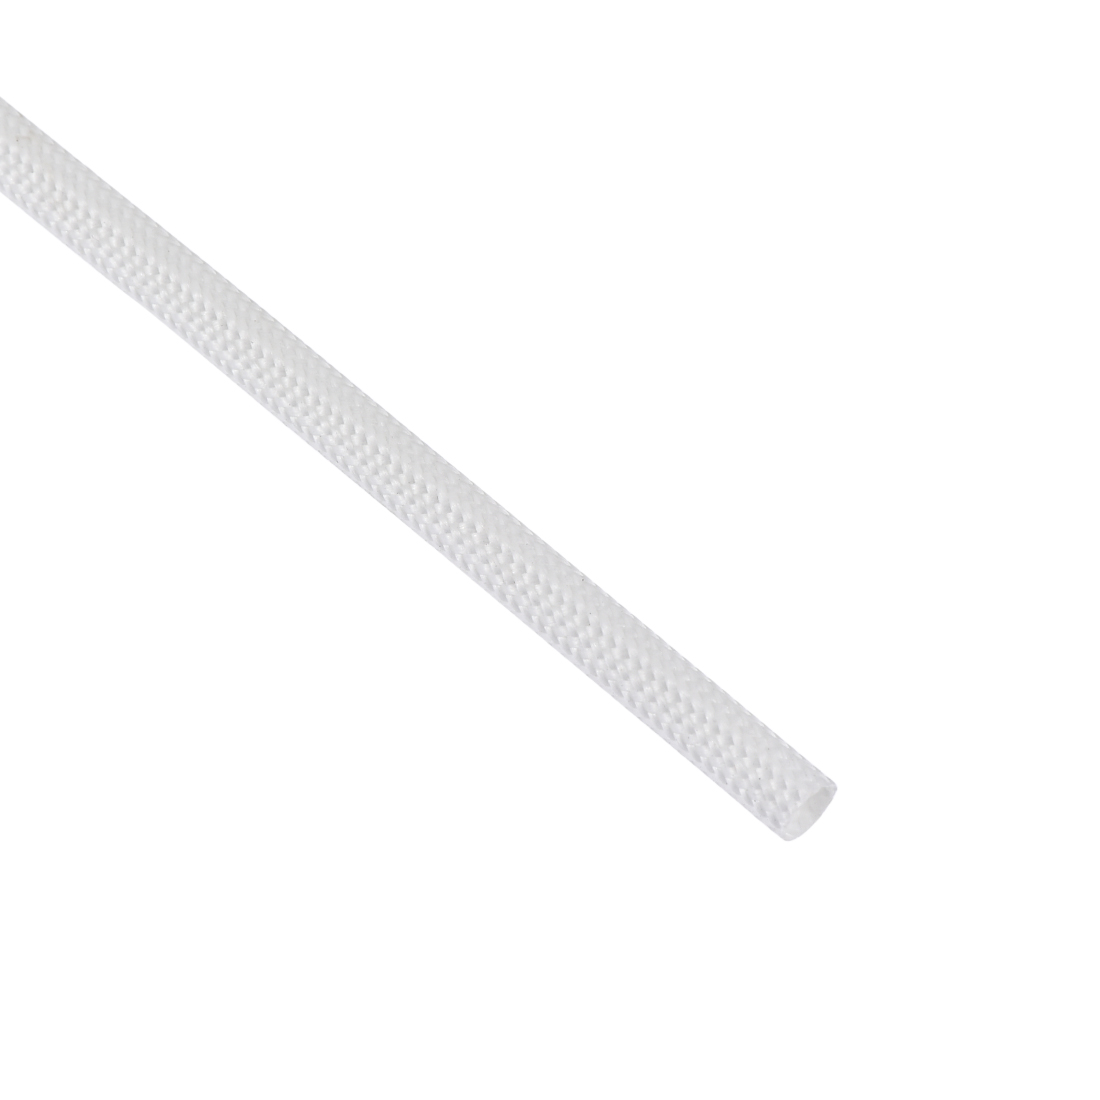 Fiberglass Rubber Silicone Insulation Retardant Sleeving 3mmx5M White